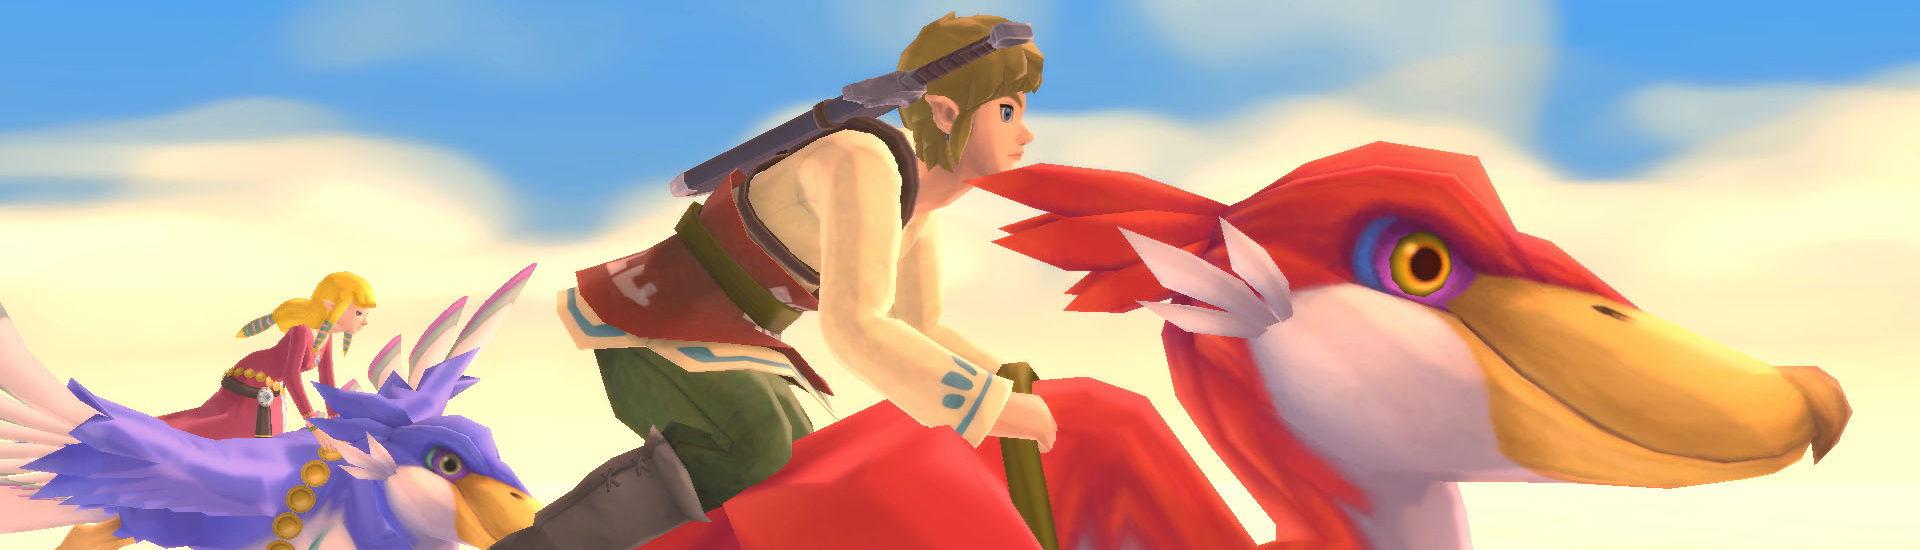 Zelda Skyward Sword Remaster: Sinnvolle amiibo-Funktion